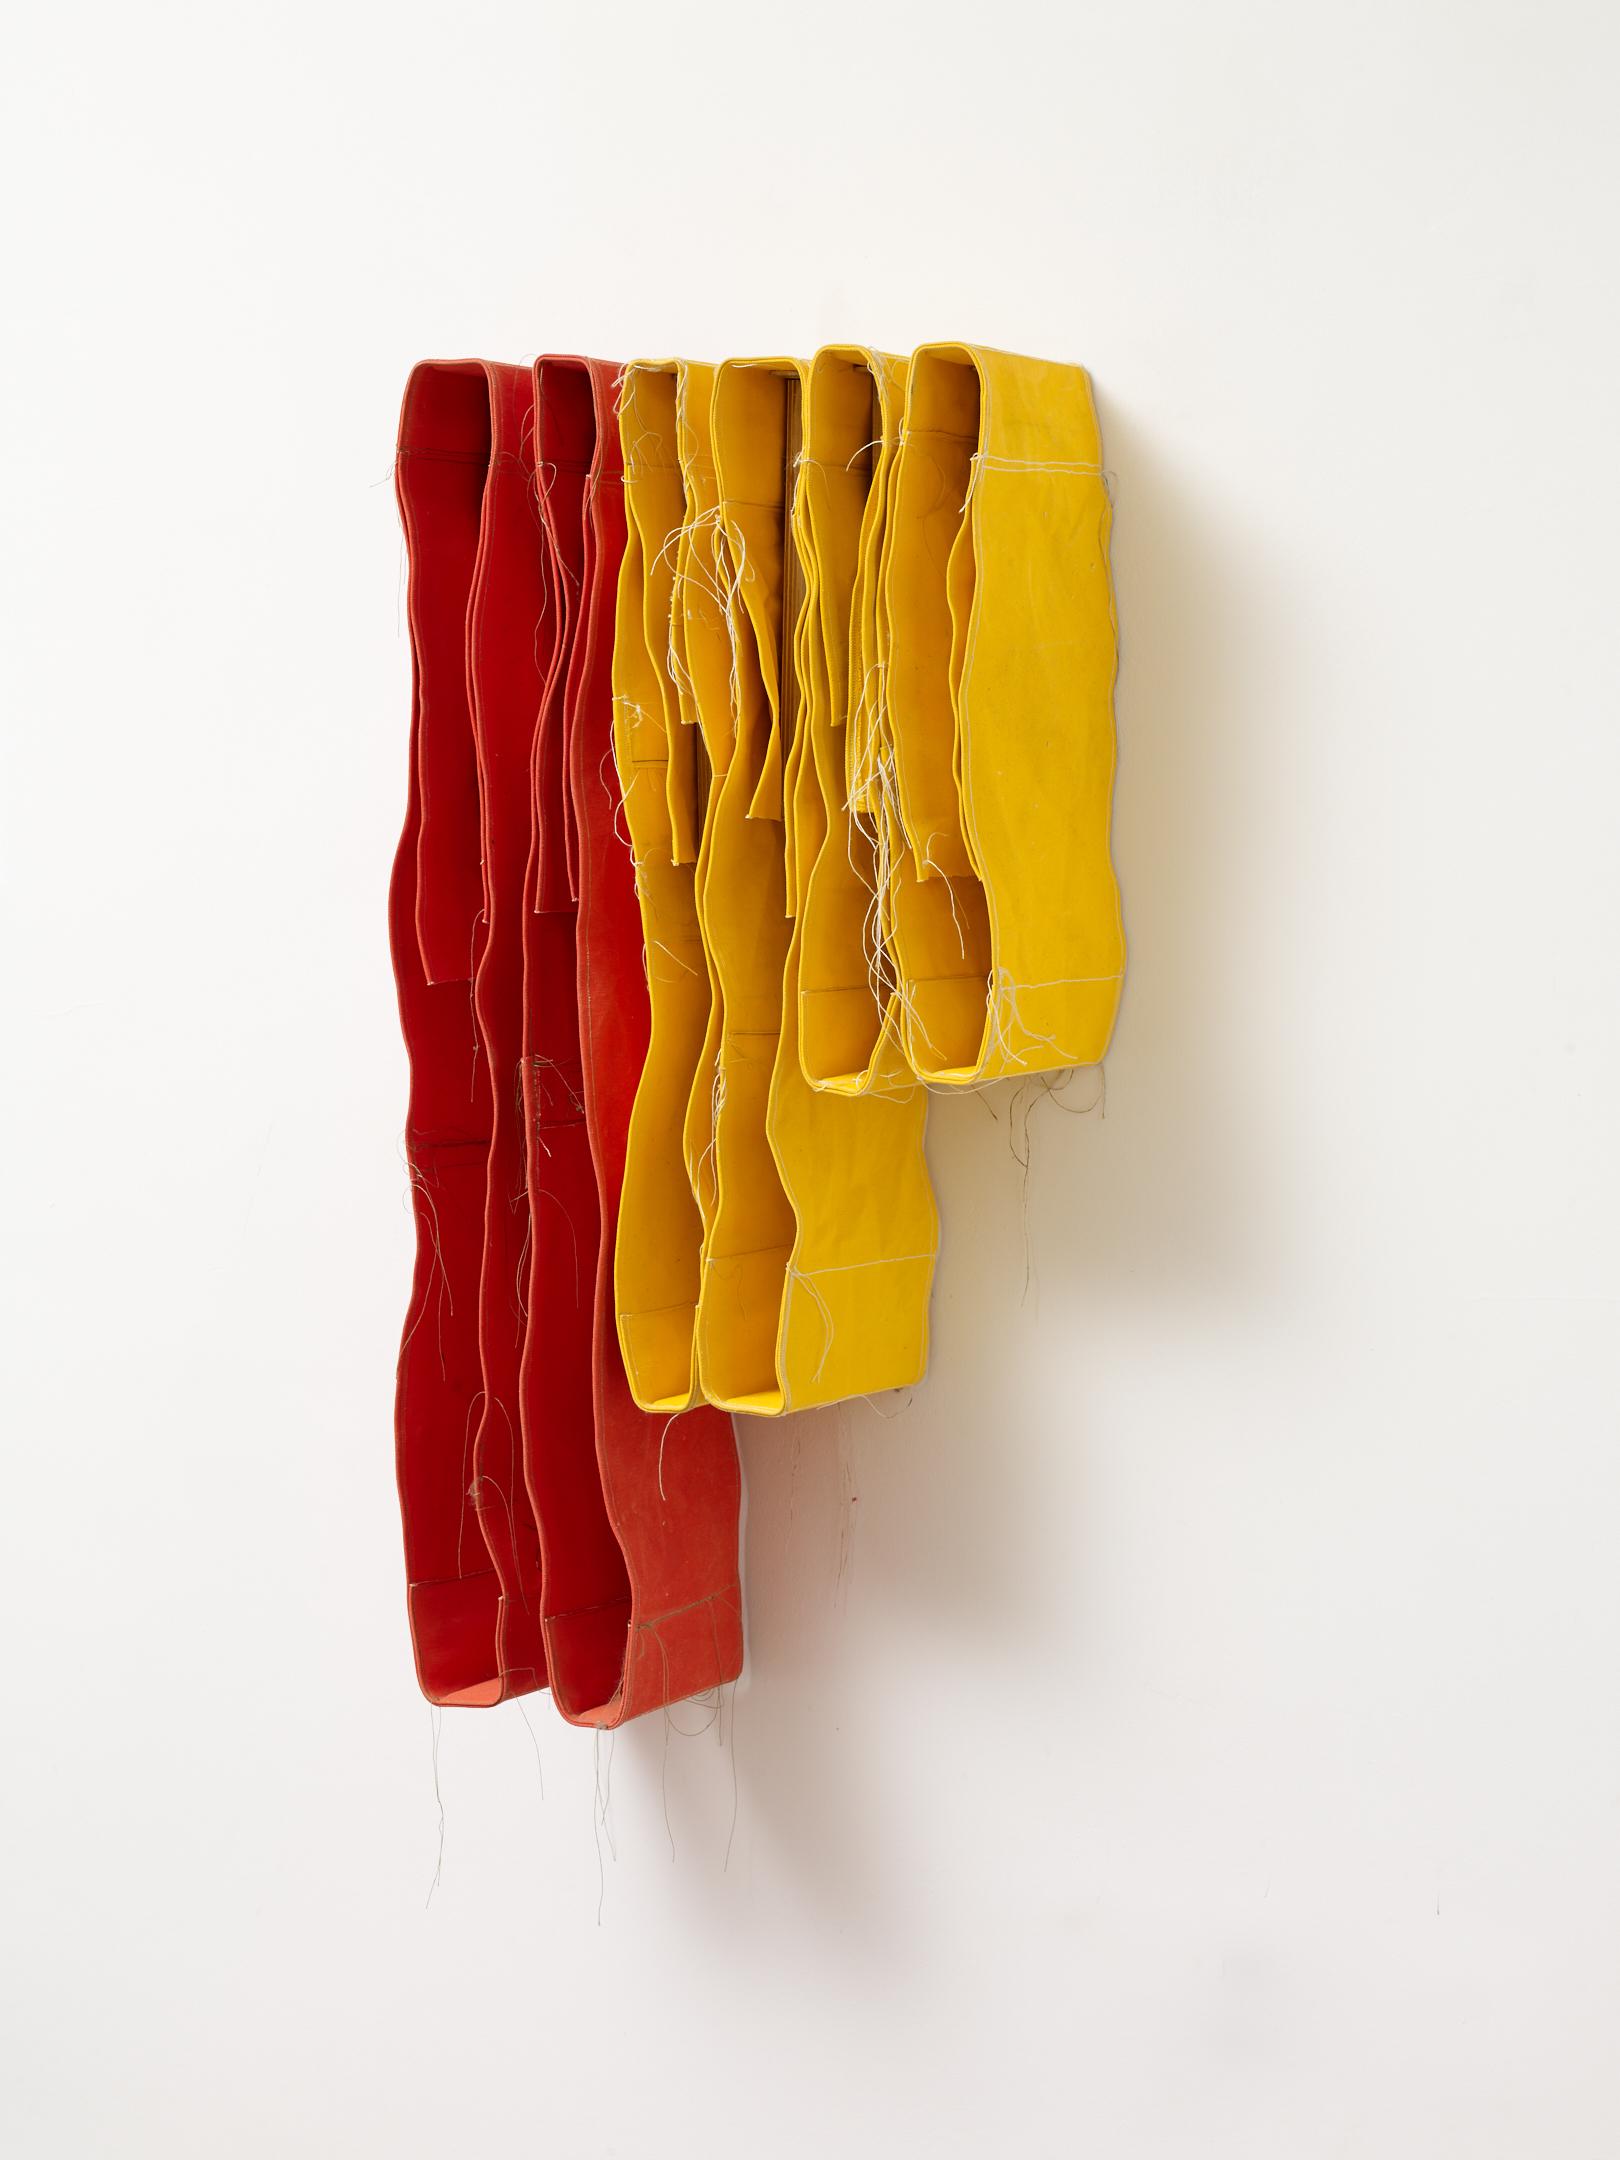 Simon Callery  3 Step Yellow & Orange Wallspine 4Y2O , 2018 Canvas, distemper, thread and steel brackets, 6 parts 80 x 30 x 20 cm